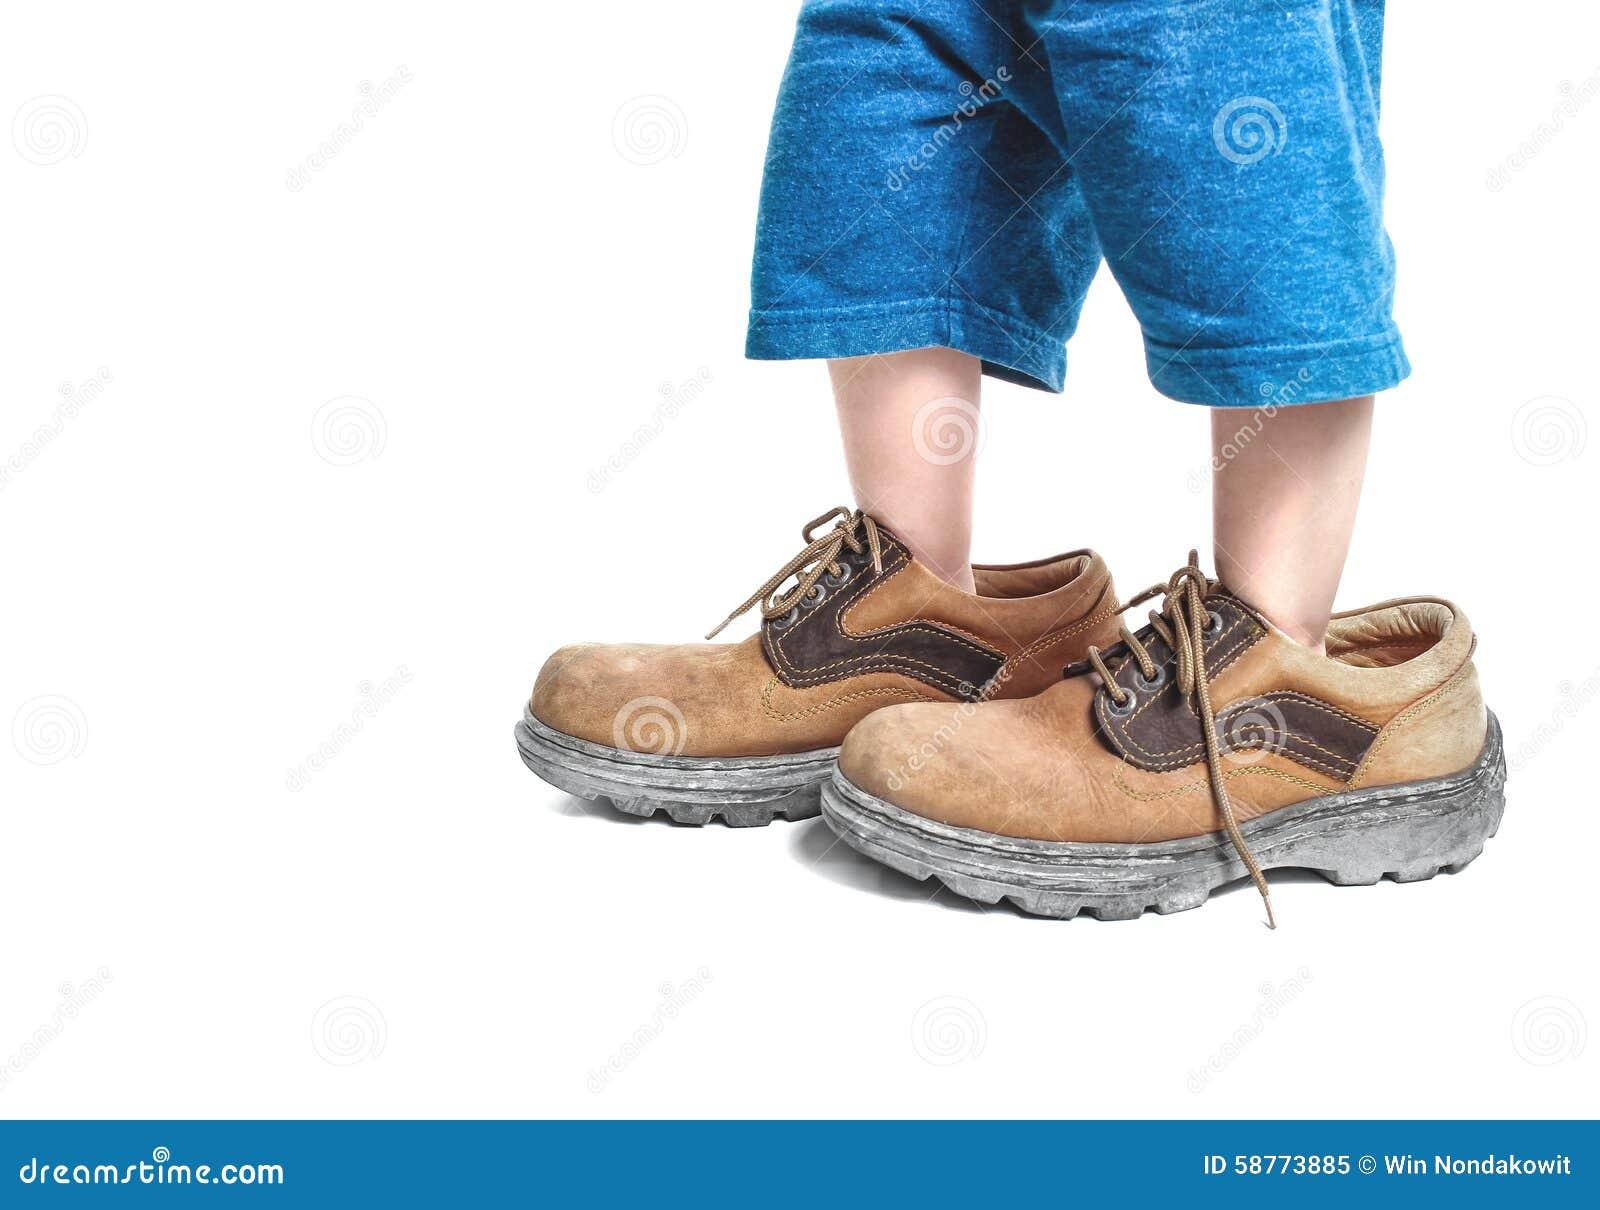 big shoes stock image image of child little cute. Black Bedroom Furniture Sets. Home Design Ideas